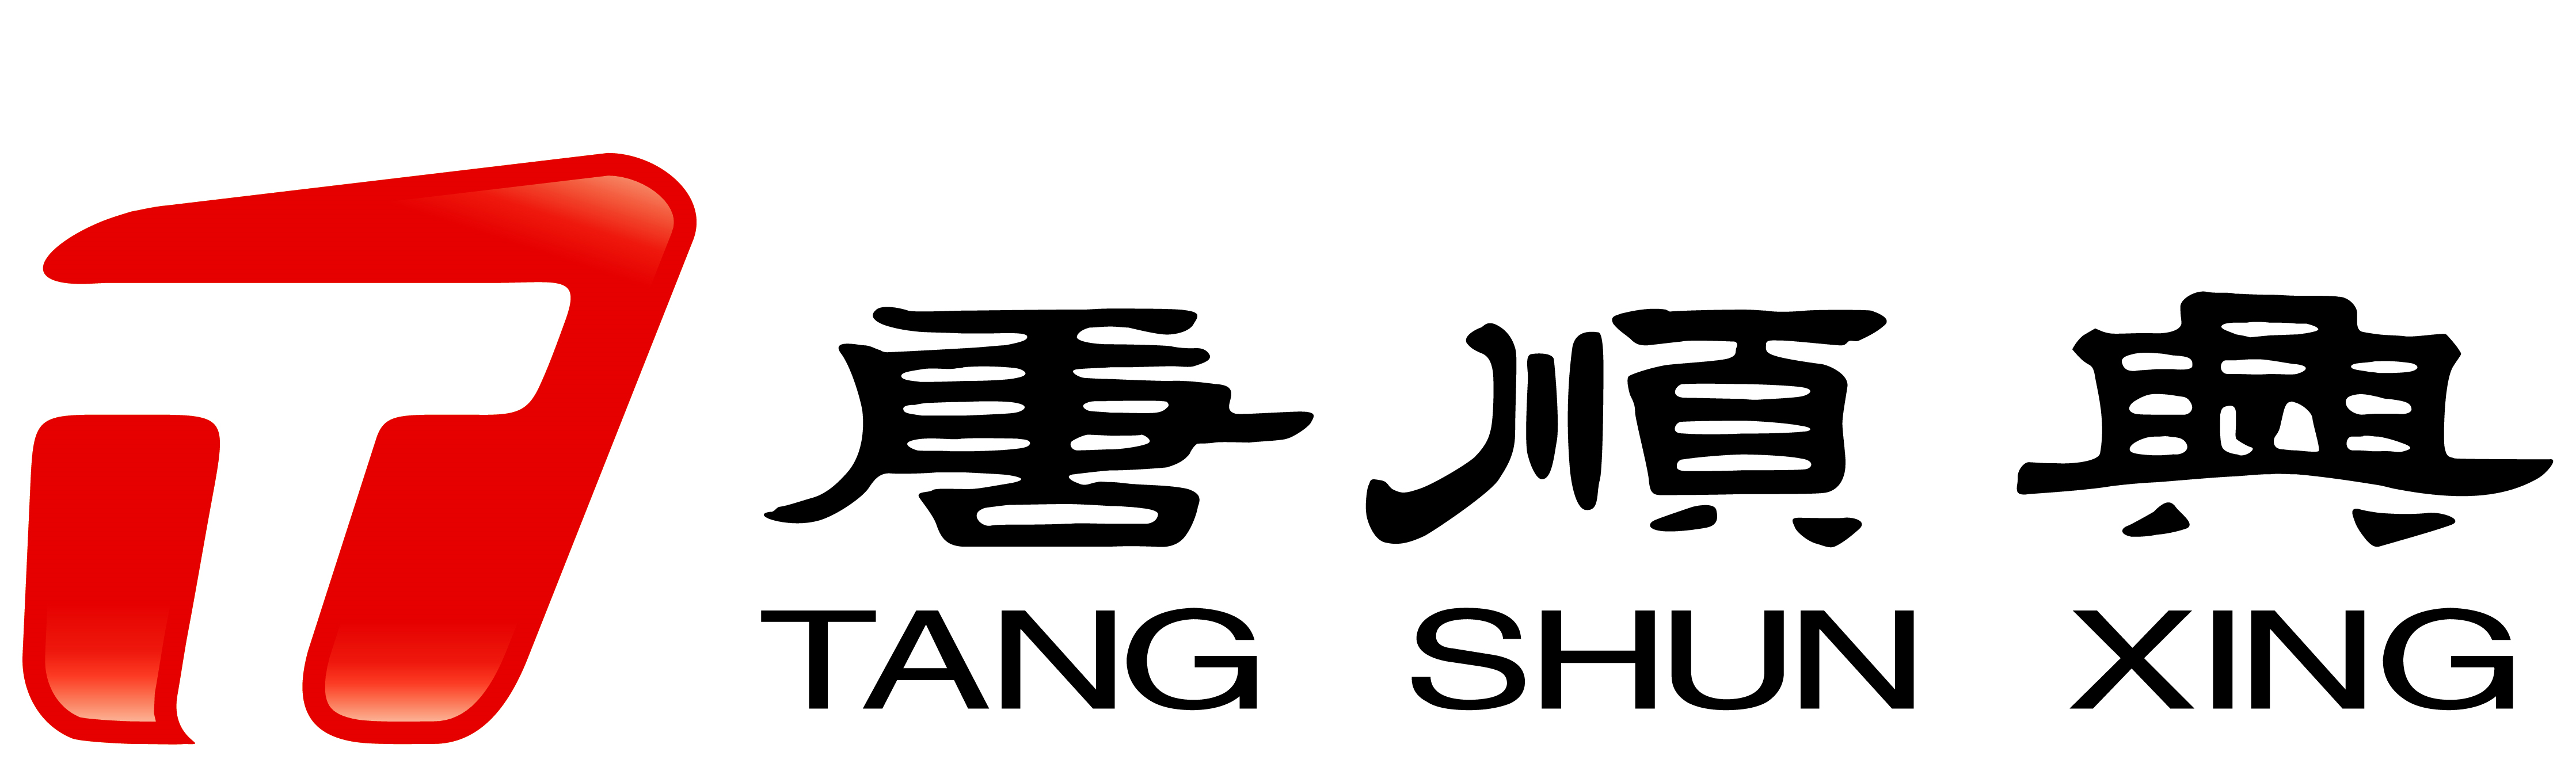 food scheme 2019 gold Tong Shun Hing